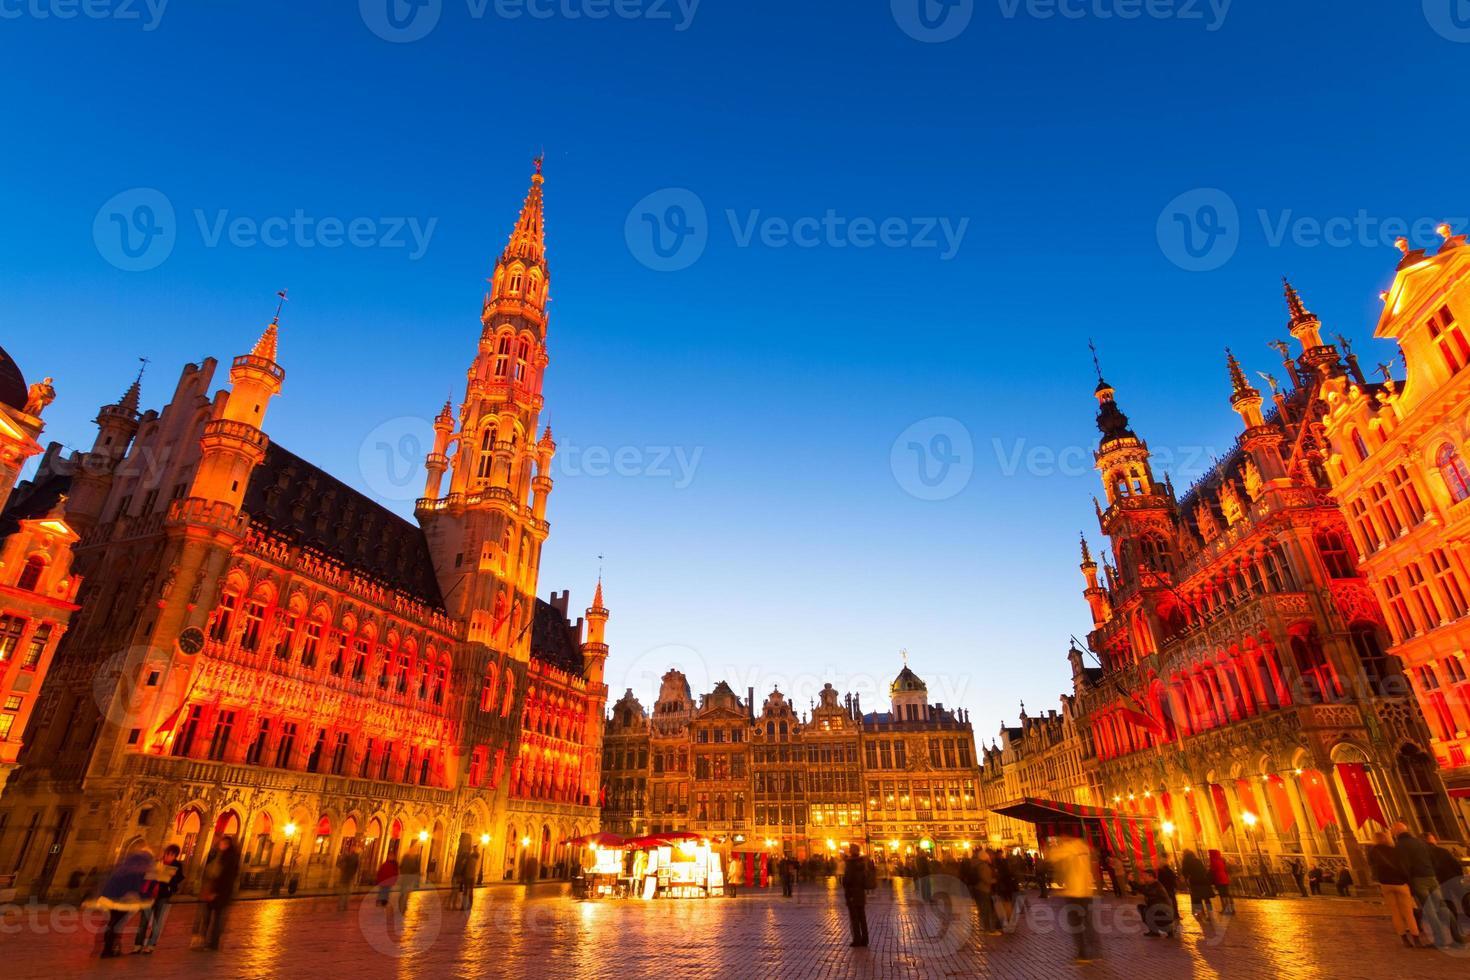 Grote Markt, Bruxelles, Belgio, Europa. foto